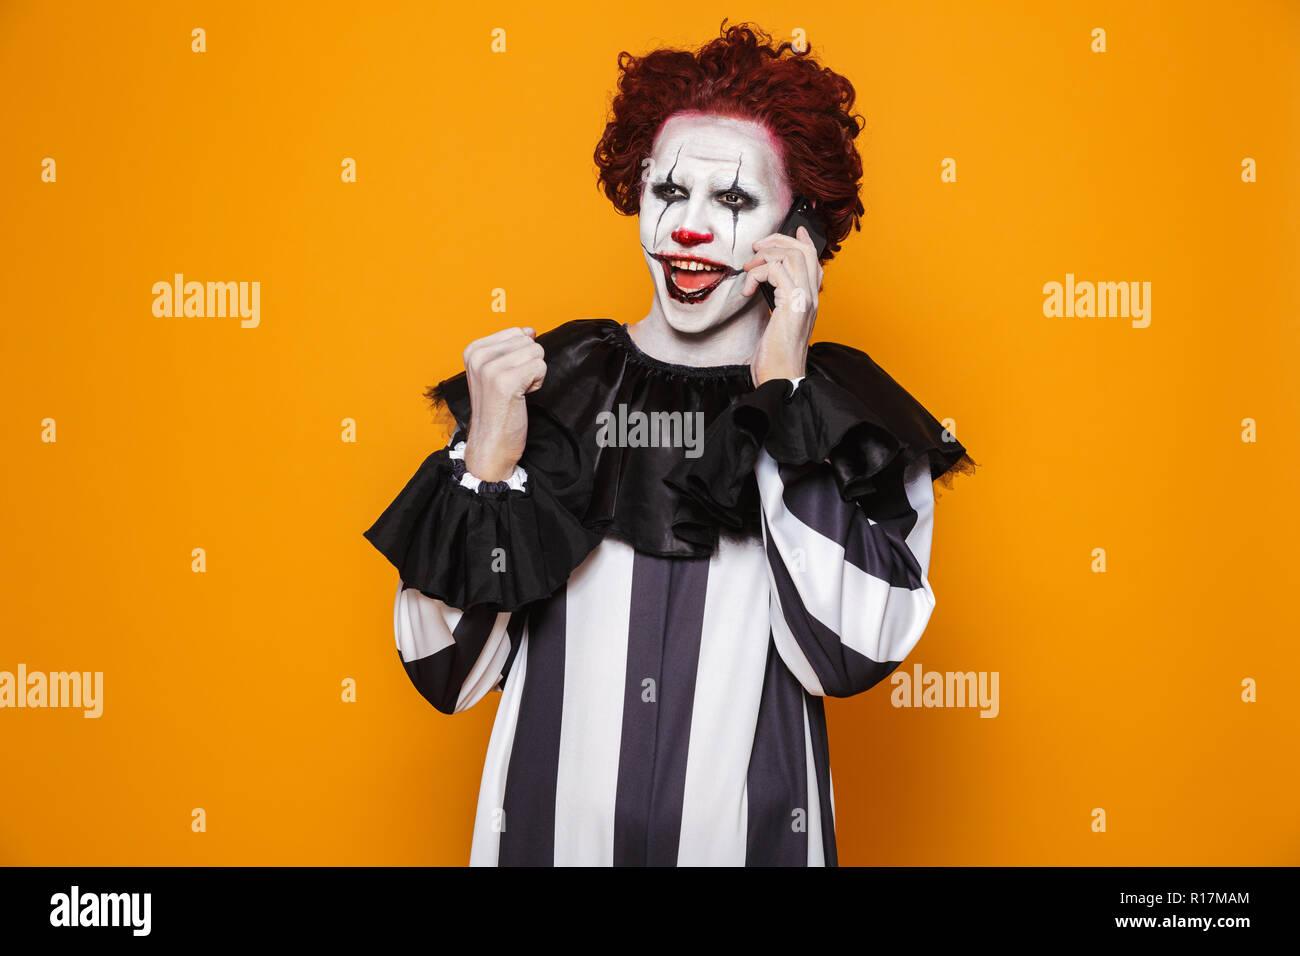 Joyful clown man 20s wearing black costume and halloween makeup talking on smartphone isolated over yellow background Stock Photo